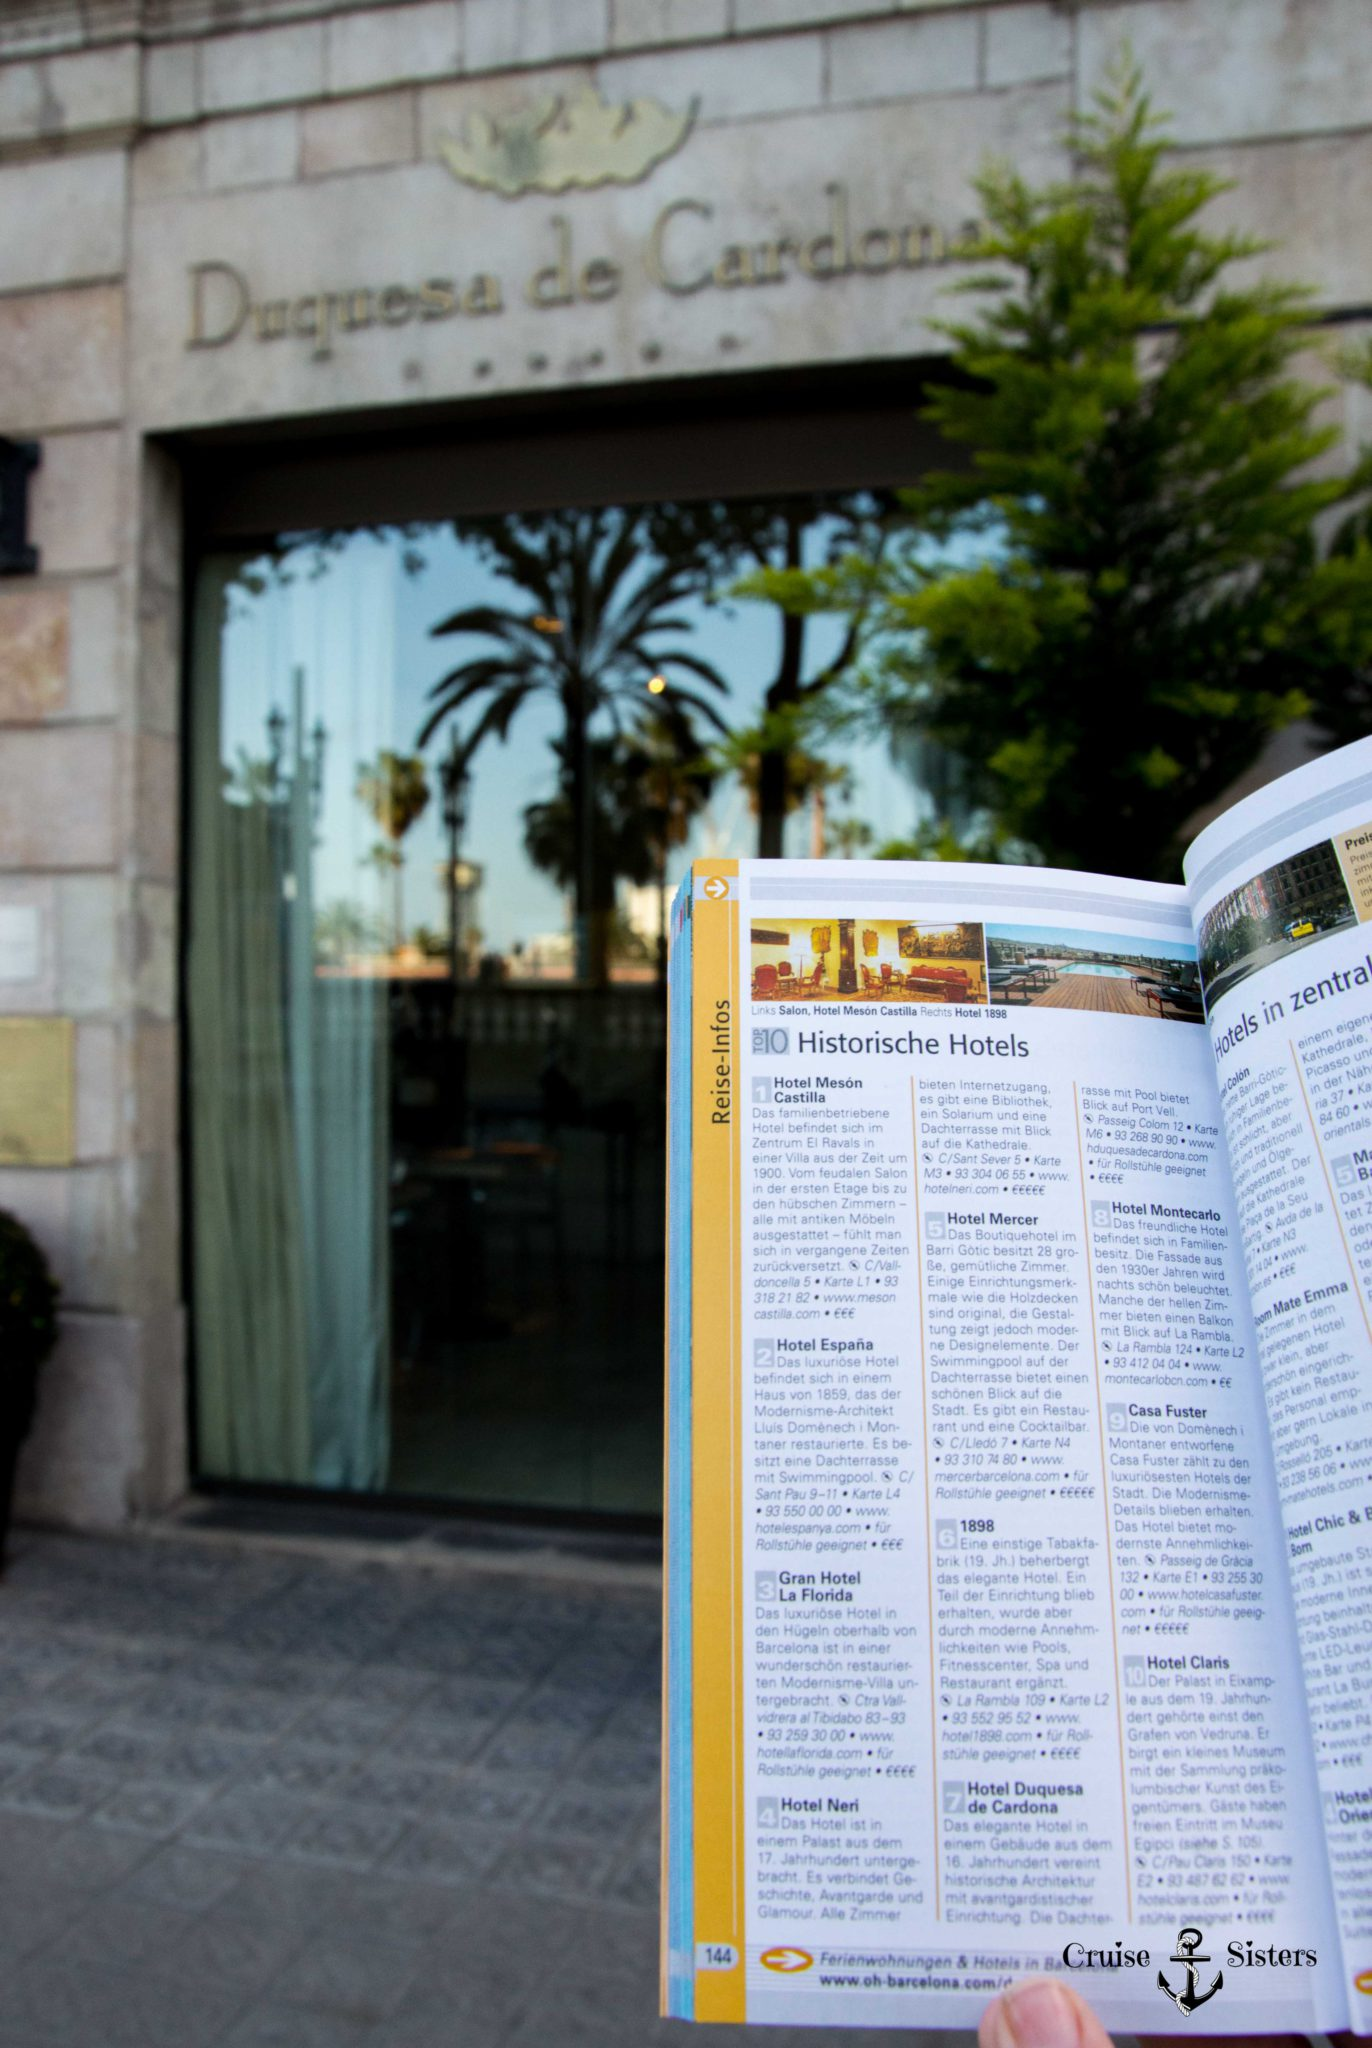 Reiseführer Top 10 Barcelona von Dorling and Kindersley vor dem Hotel Dequesa de Cardon in Barcelona